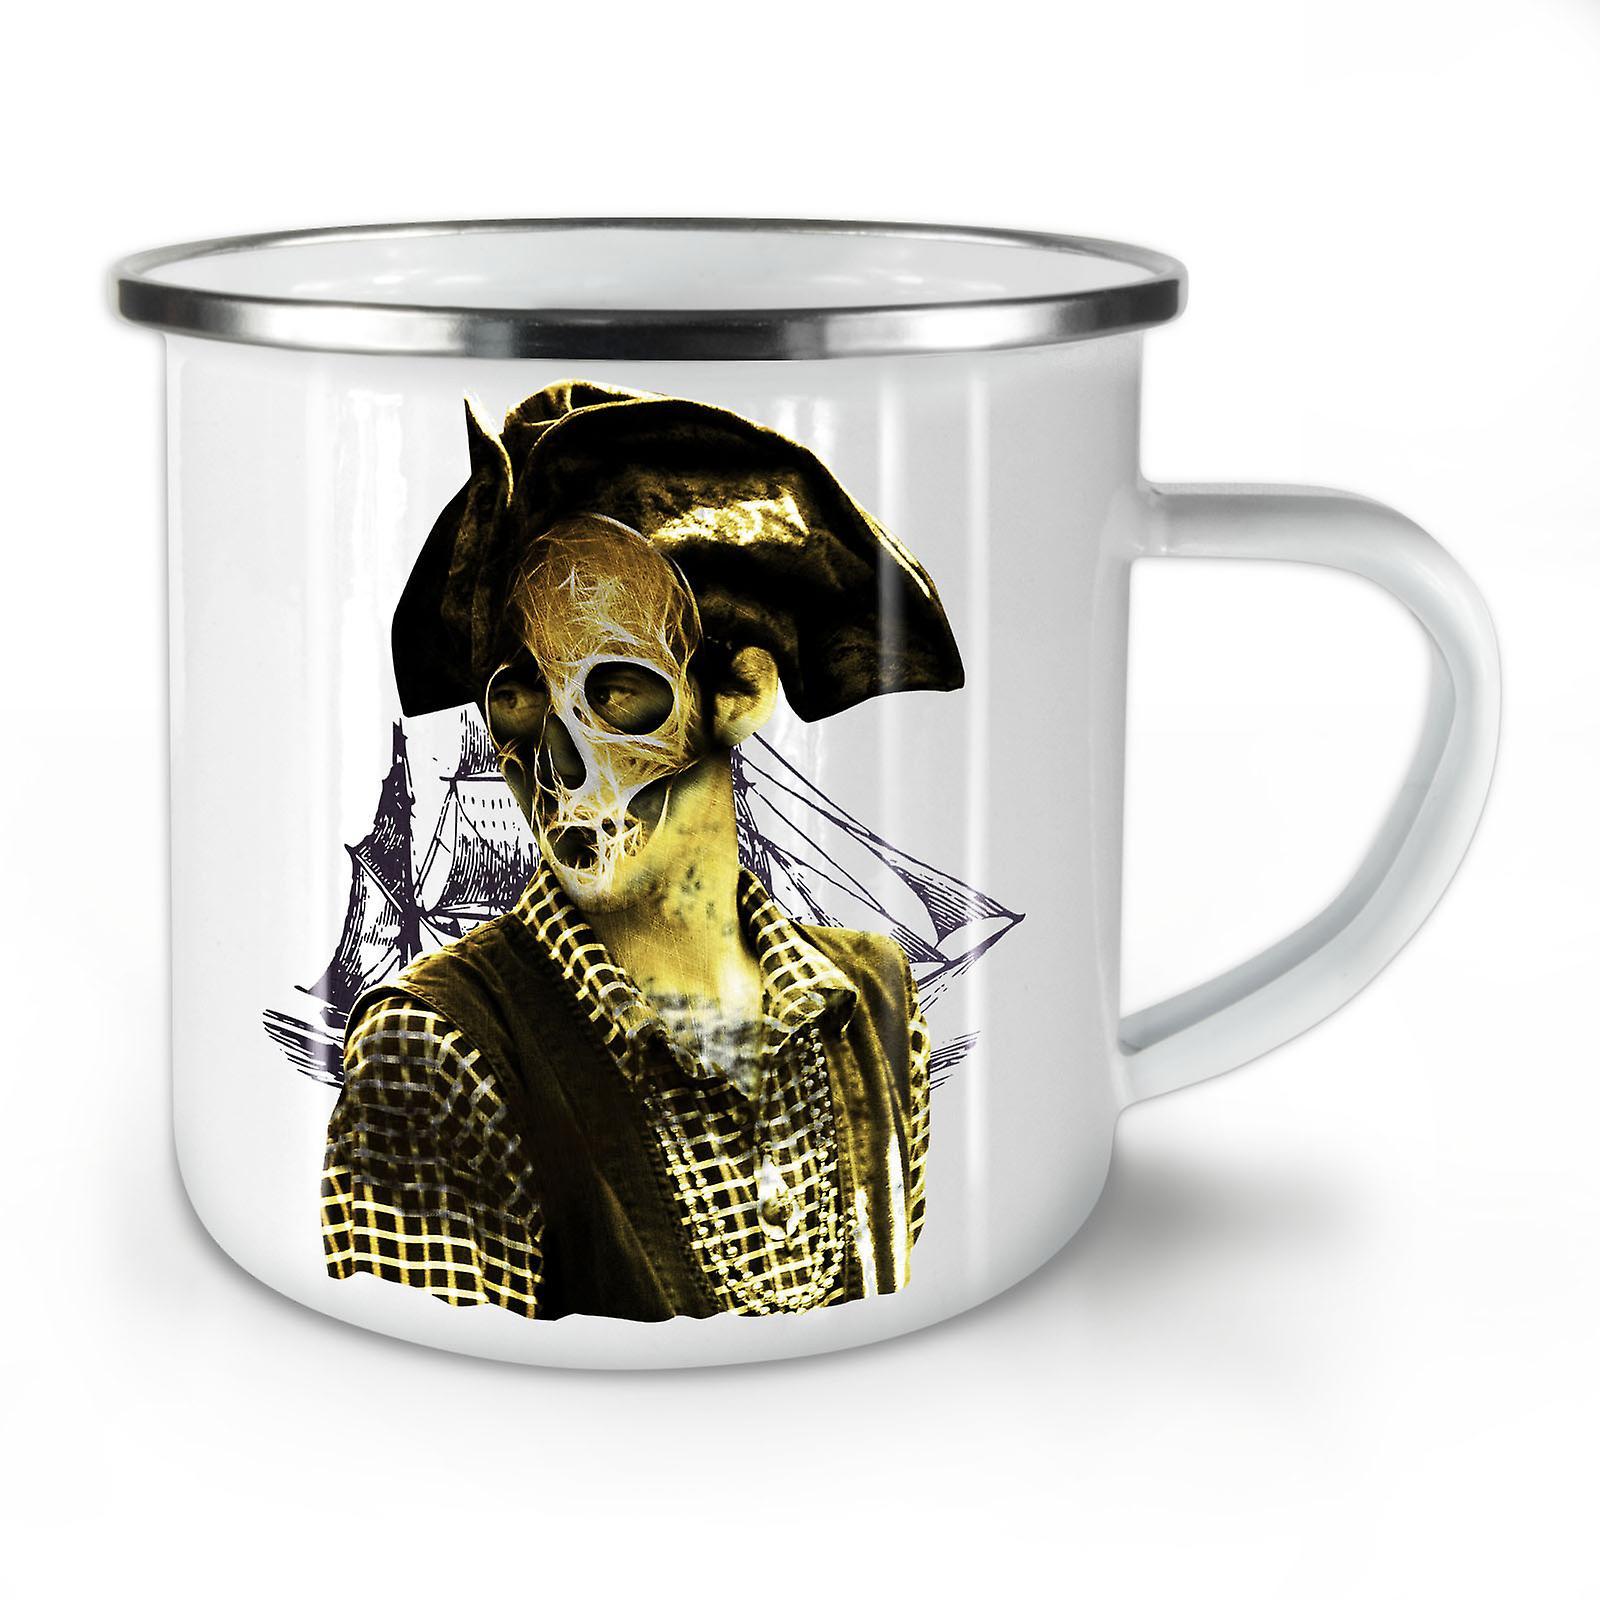 Pirate Café Death Émail Nouveau Whitetea Mug10 OzWellcoda Métal 0wyvm8OPnN